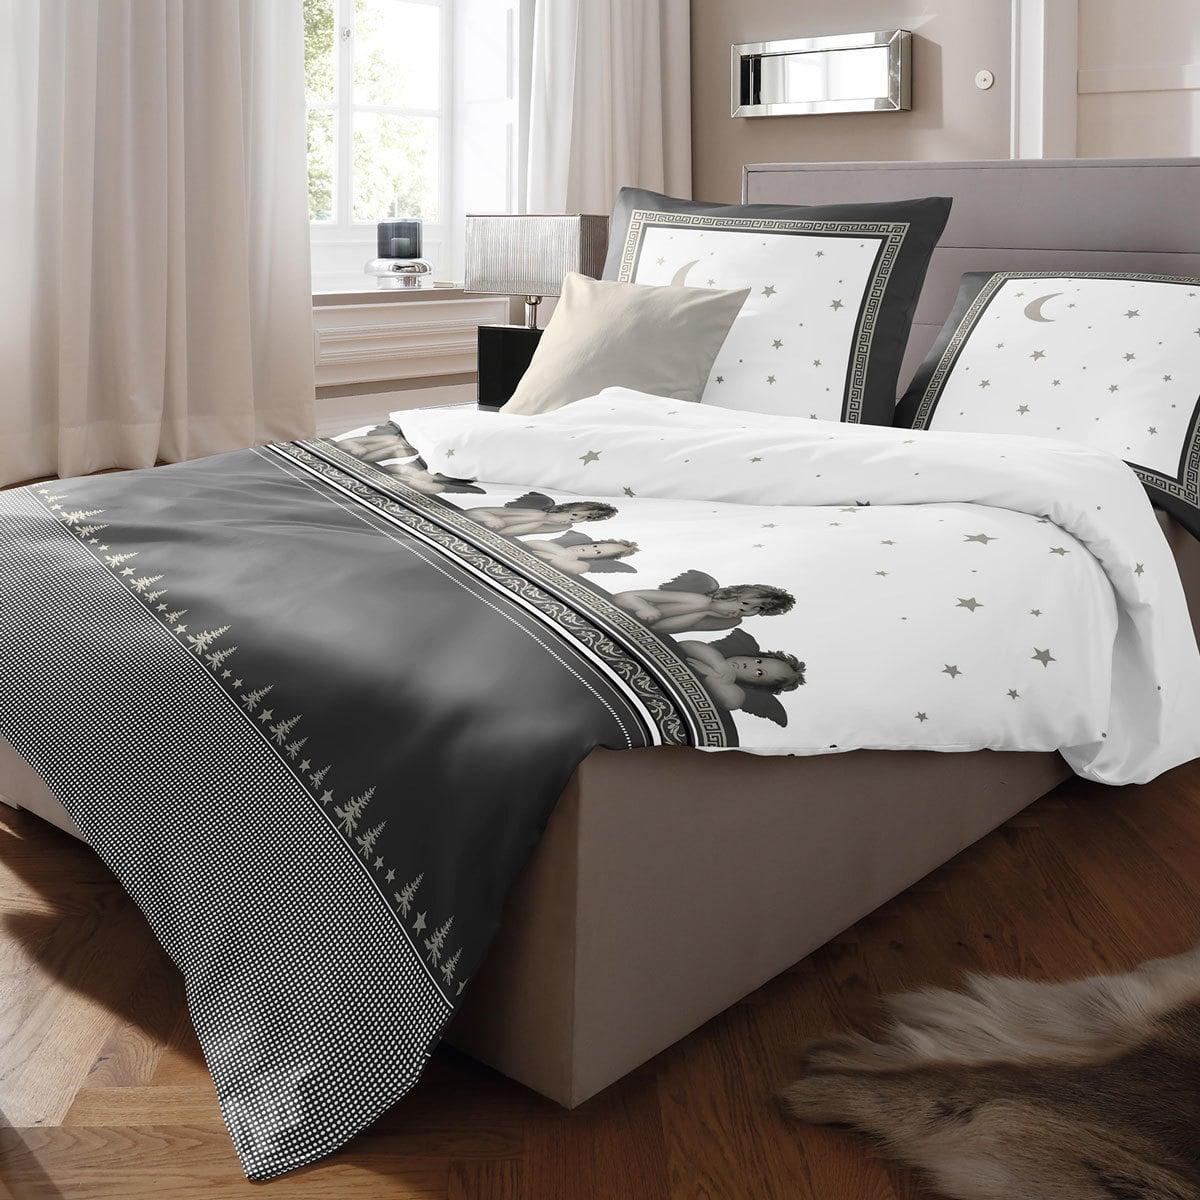 fleuresse biber bettw sche davos engel g nstig online kaufen bei bettwaren shop. Black Bedroom Furniture Sets. Home Design Ideas